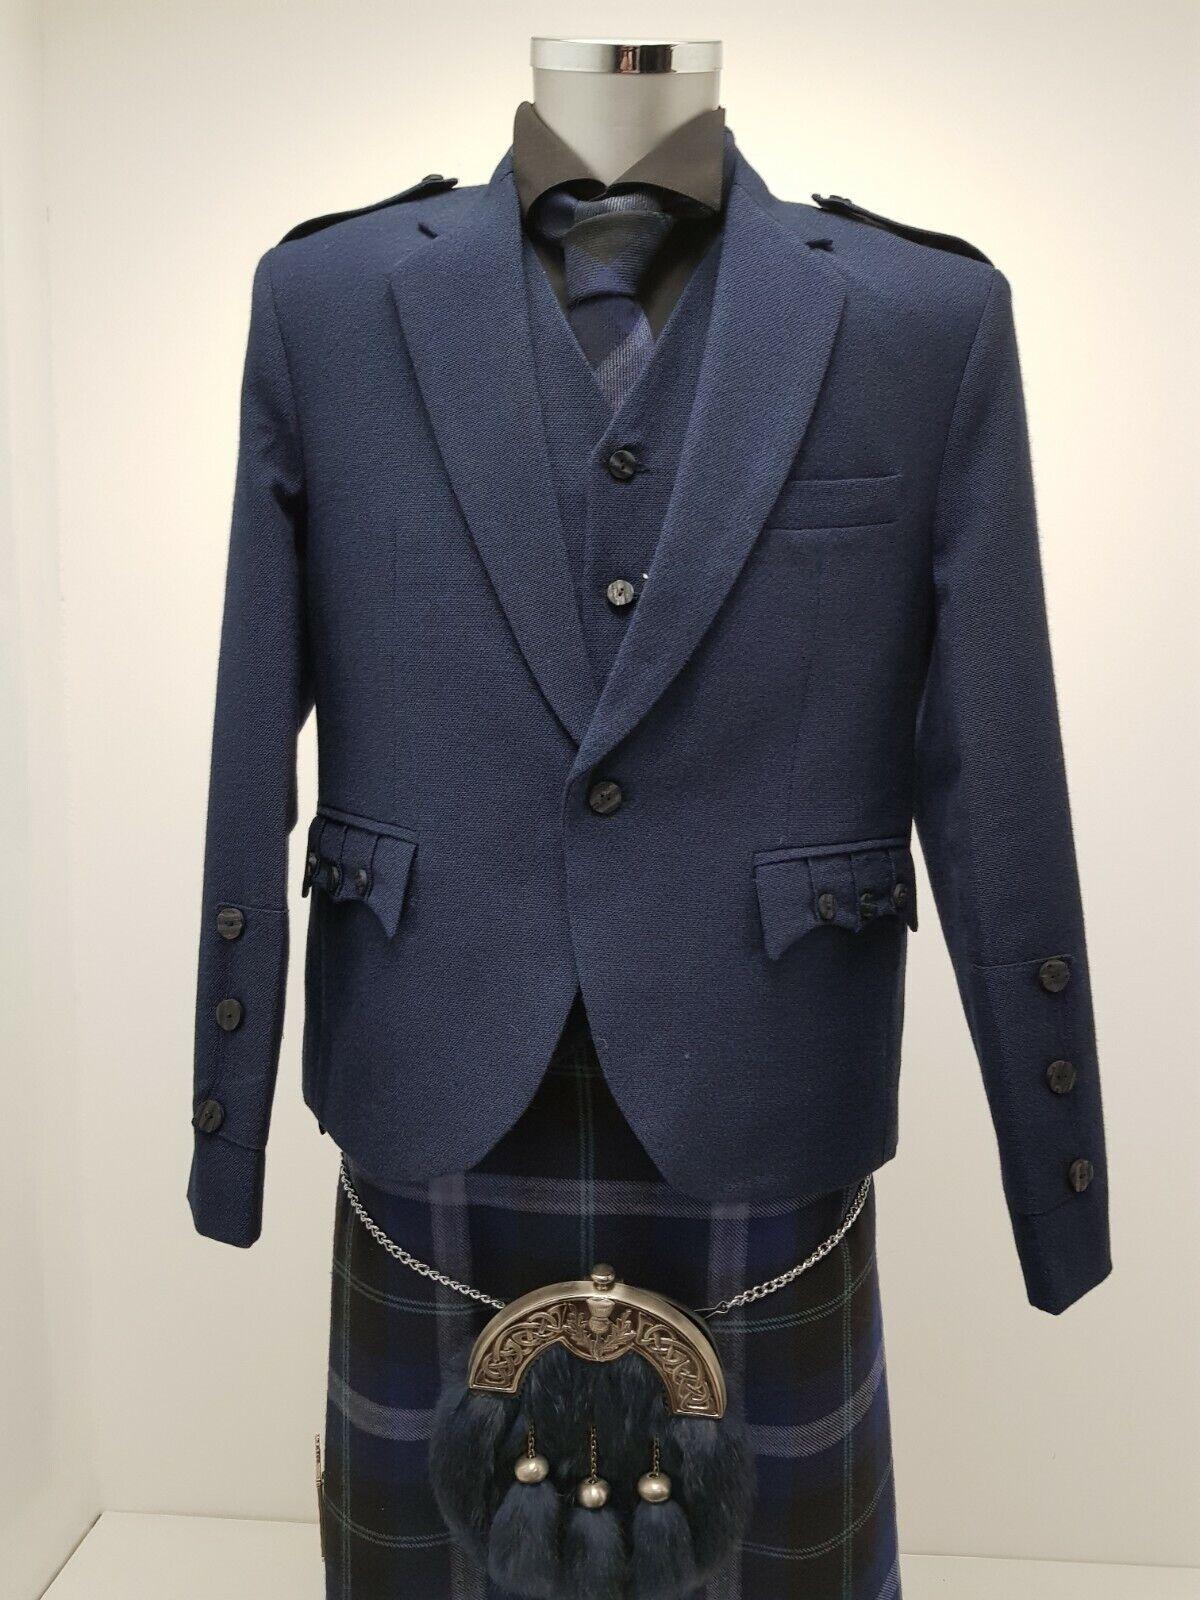 Navy Arrochar Tweed Crail Kilt Jacket & Vest Made In Scotland in Stock New Line